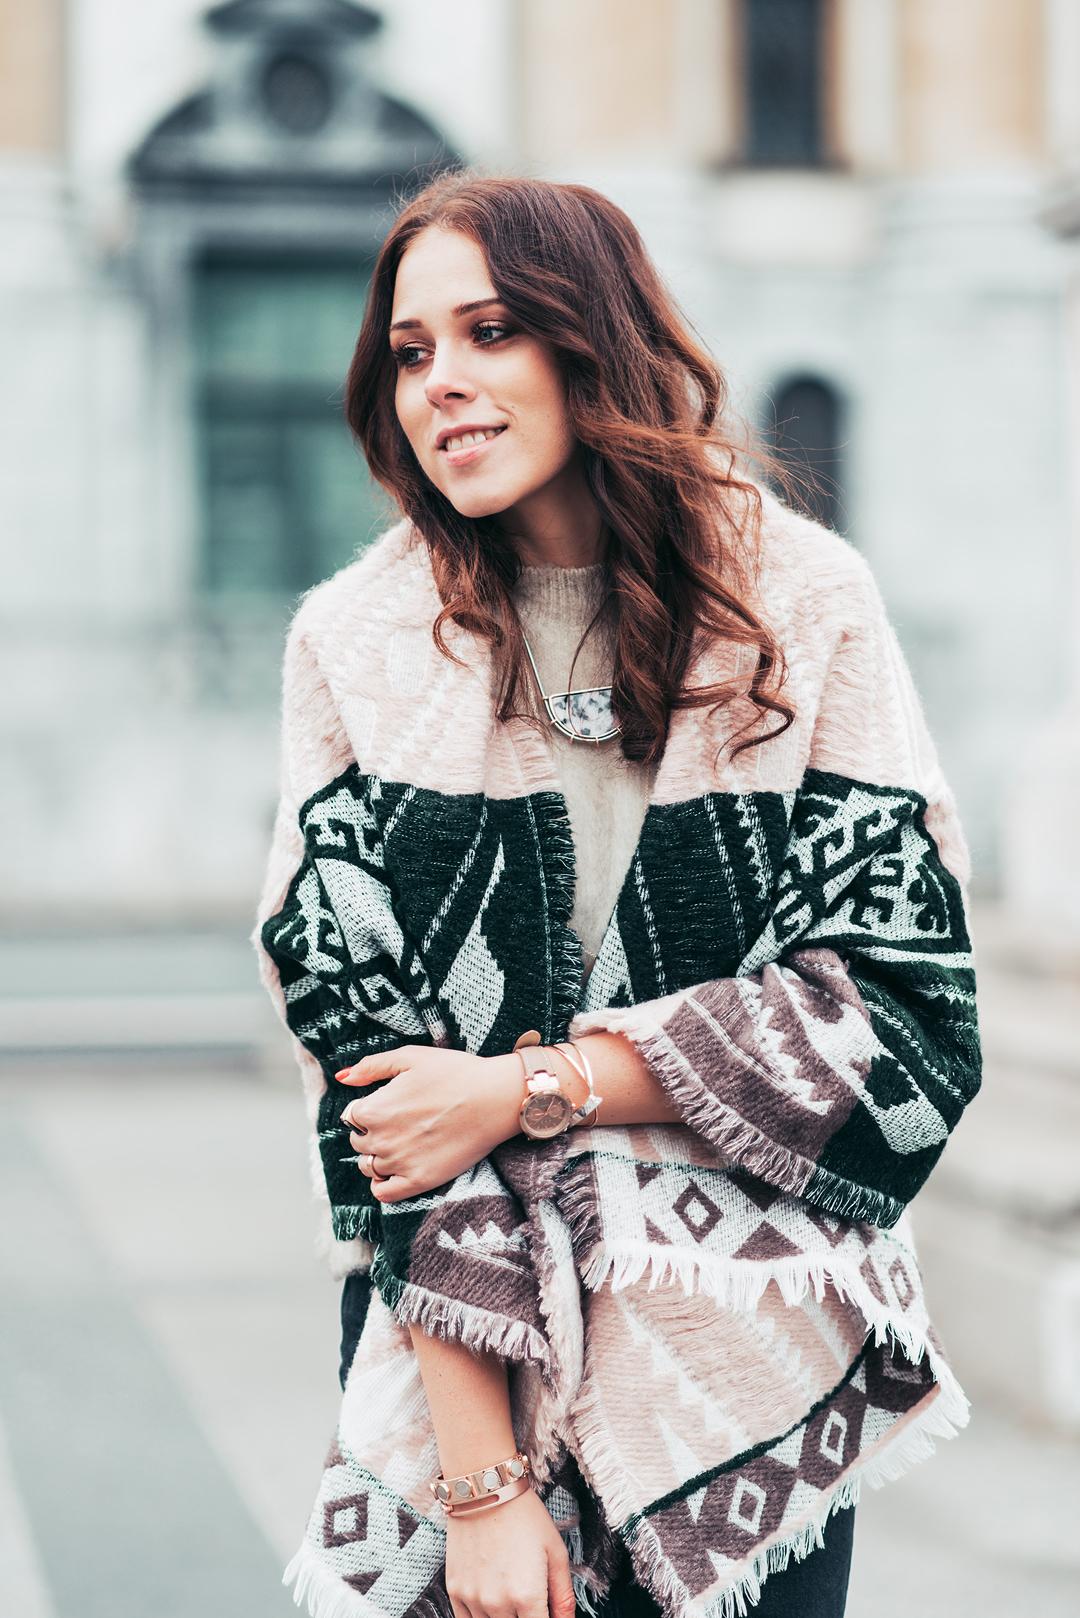 eva-ahacevcic_love-eva_parfois_nakit_modni-dodatki_jewellery_accessories_ootd-1